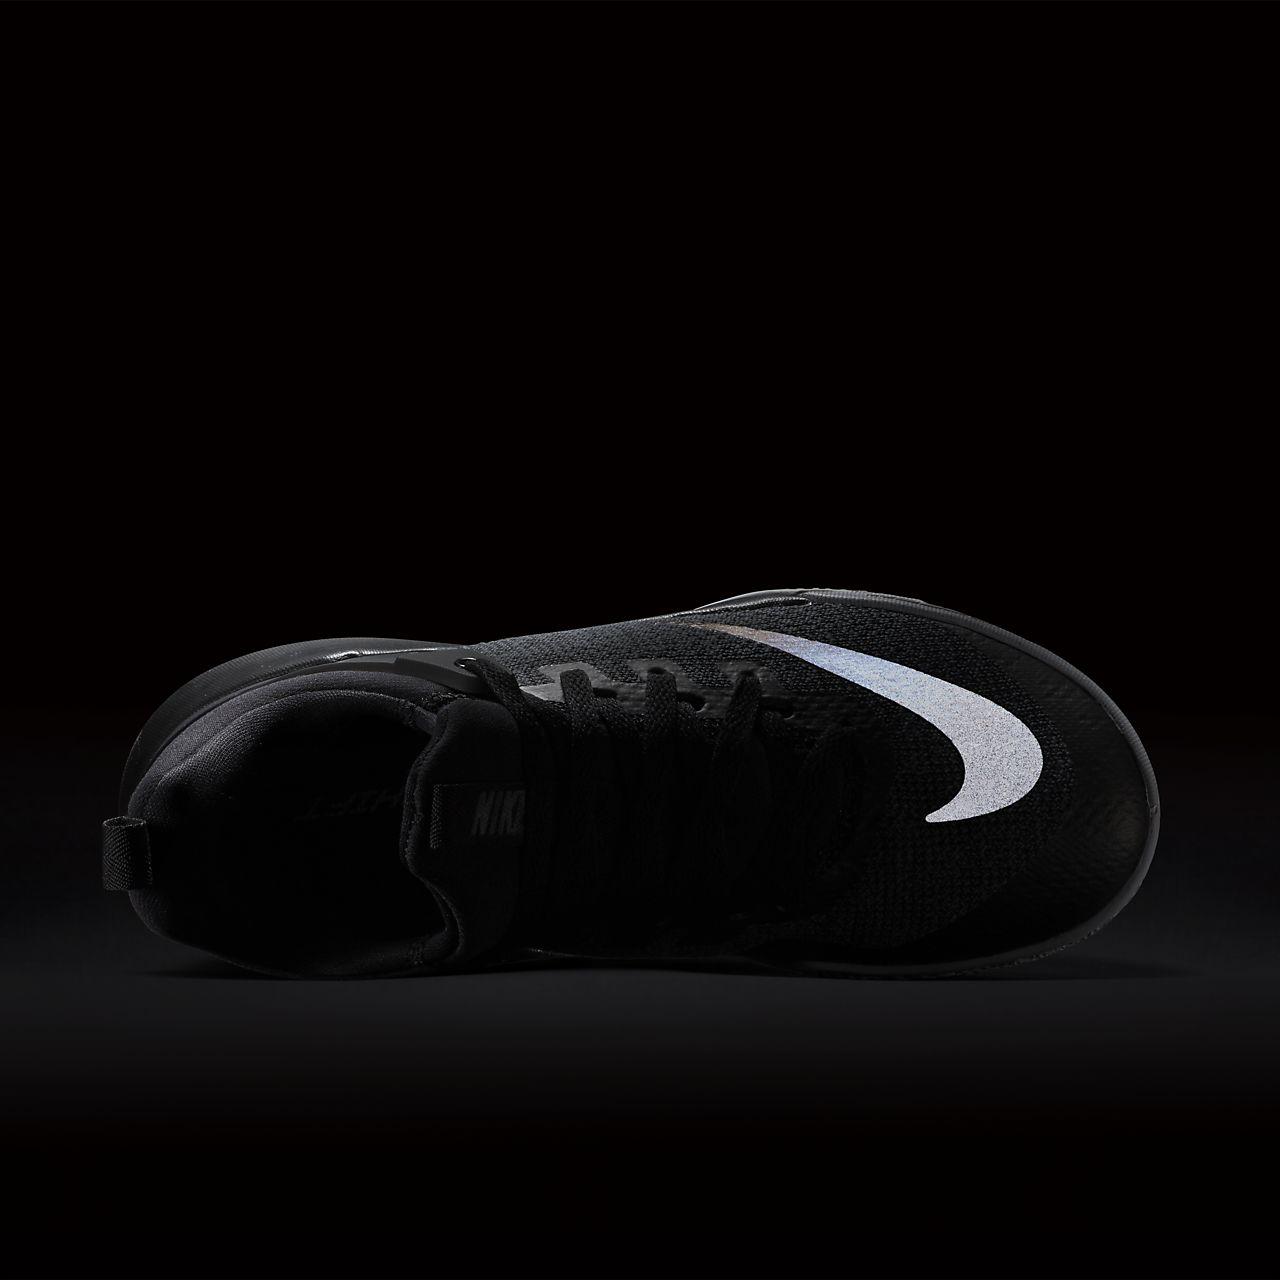 55850c7b3741 Nike Zoom Shift Women s Basketball Shoe. Nike.com AU